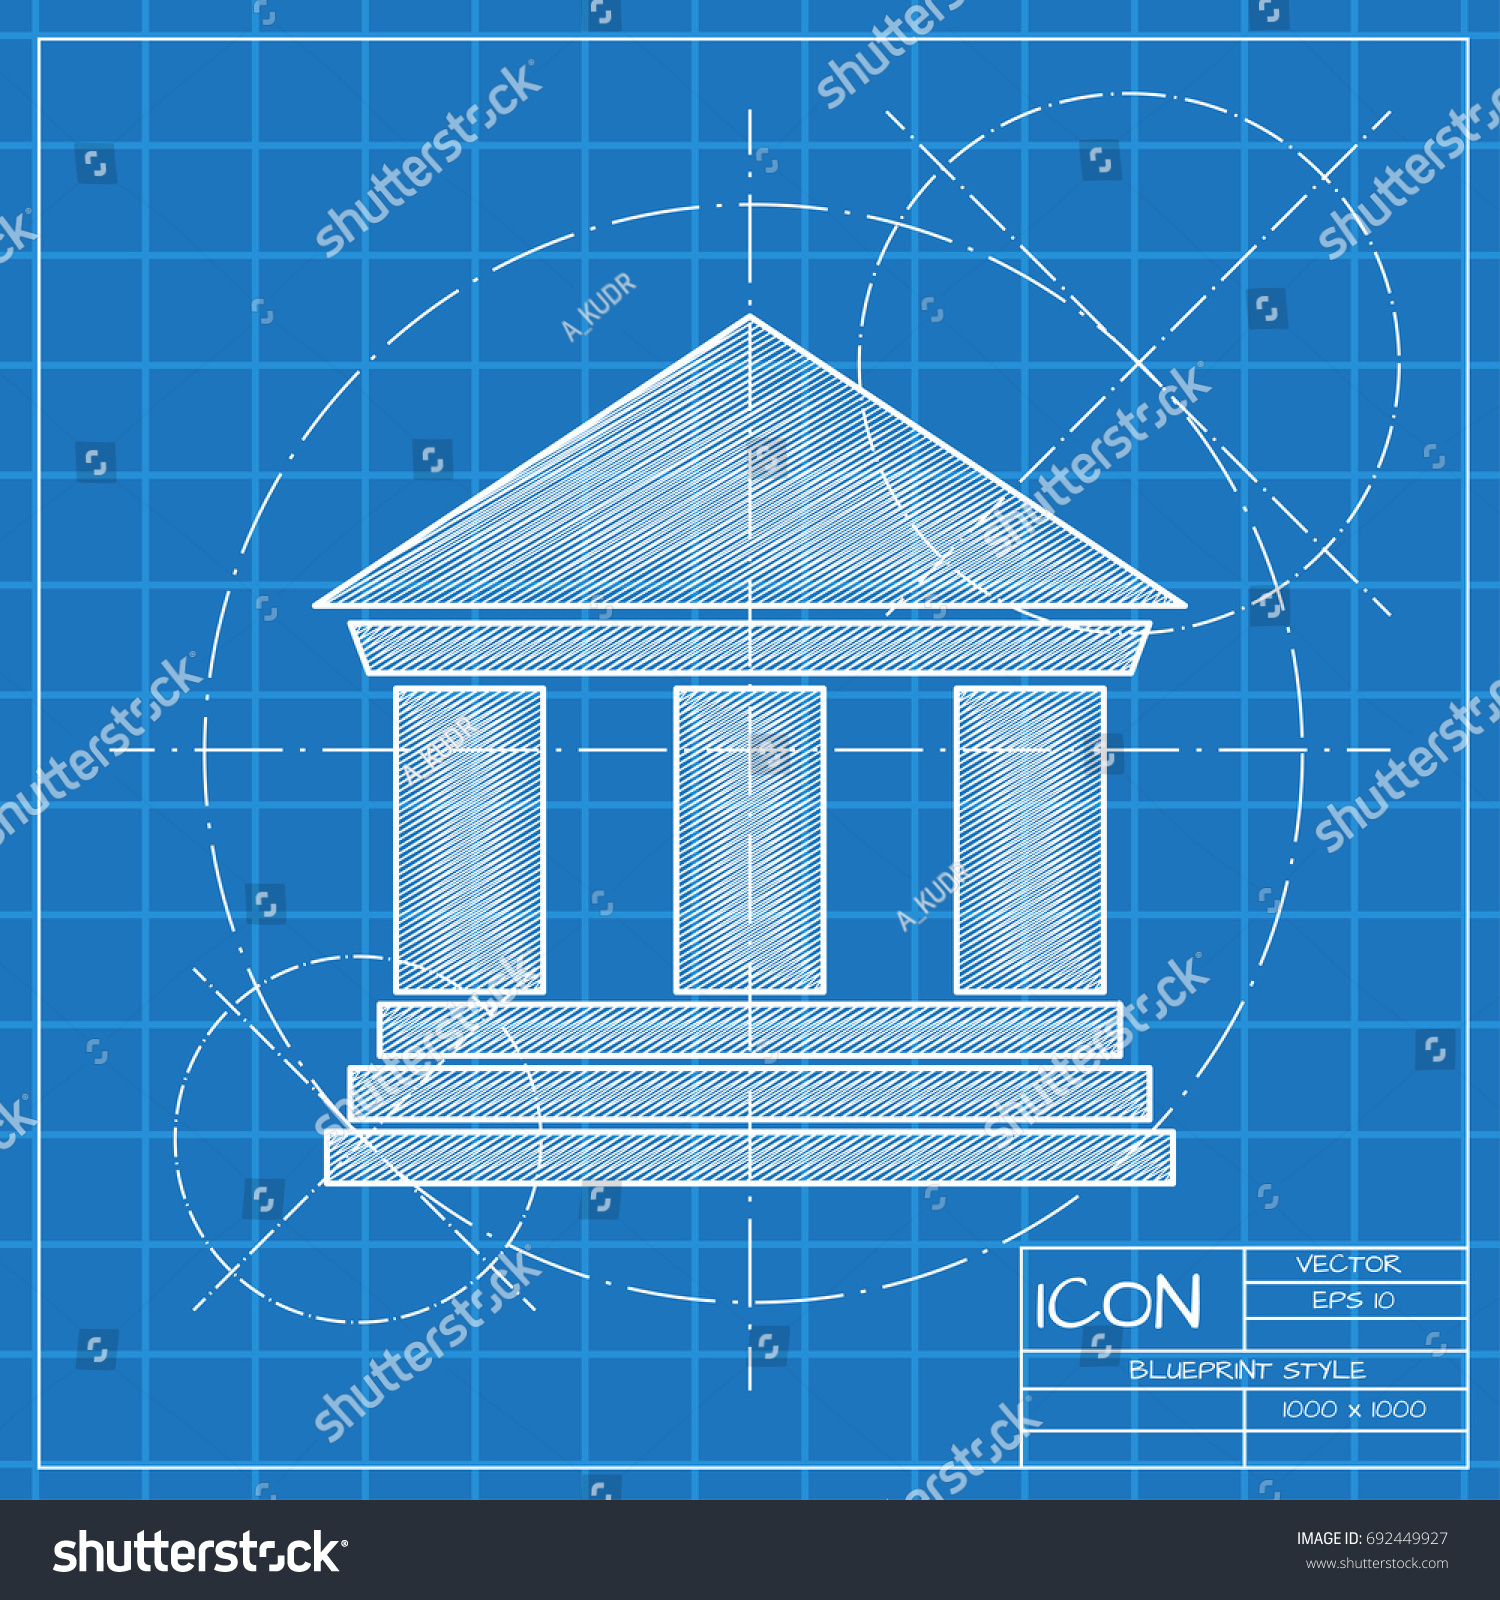 Vector blueprint building icon on engineer stock vector 692449927 vector blueprint building icon on engineer stock vector 692449927 shutterstock malvernweather Images